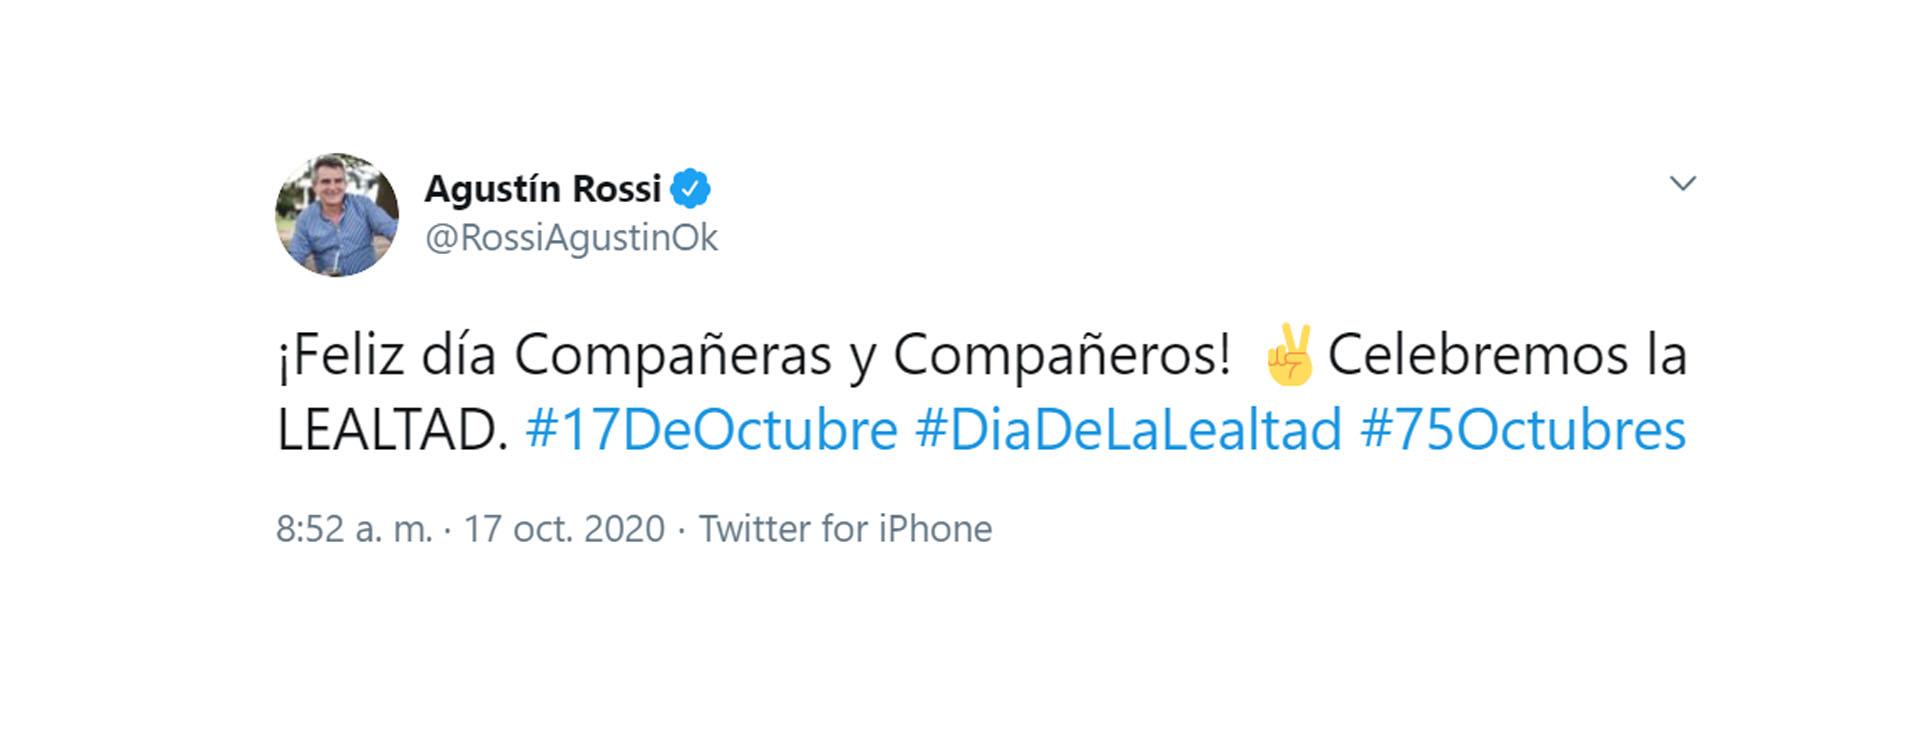 Mensaje del ministro de Defensa, Agustín Rossi